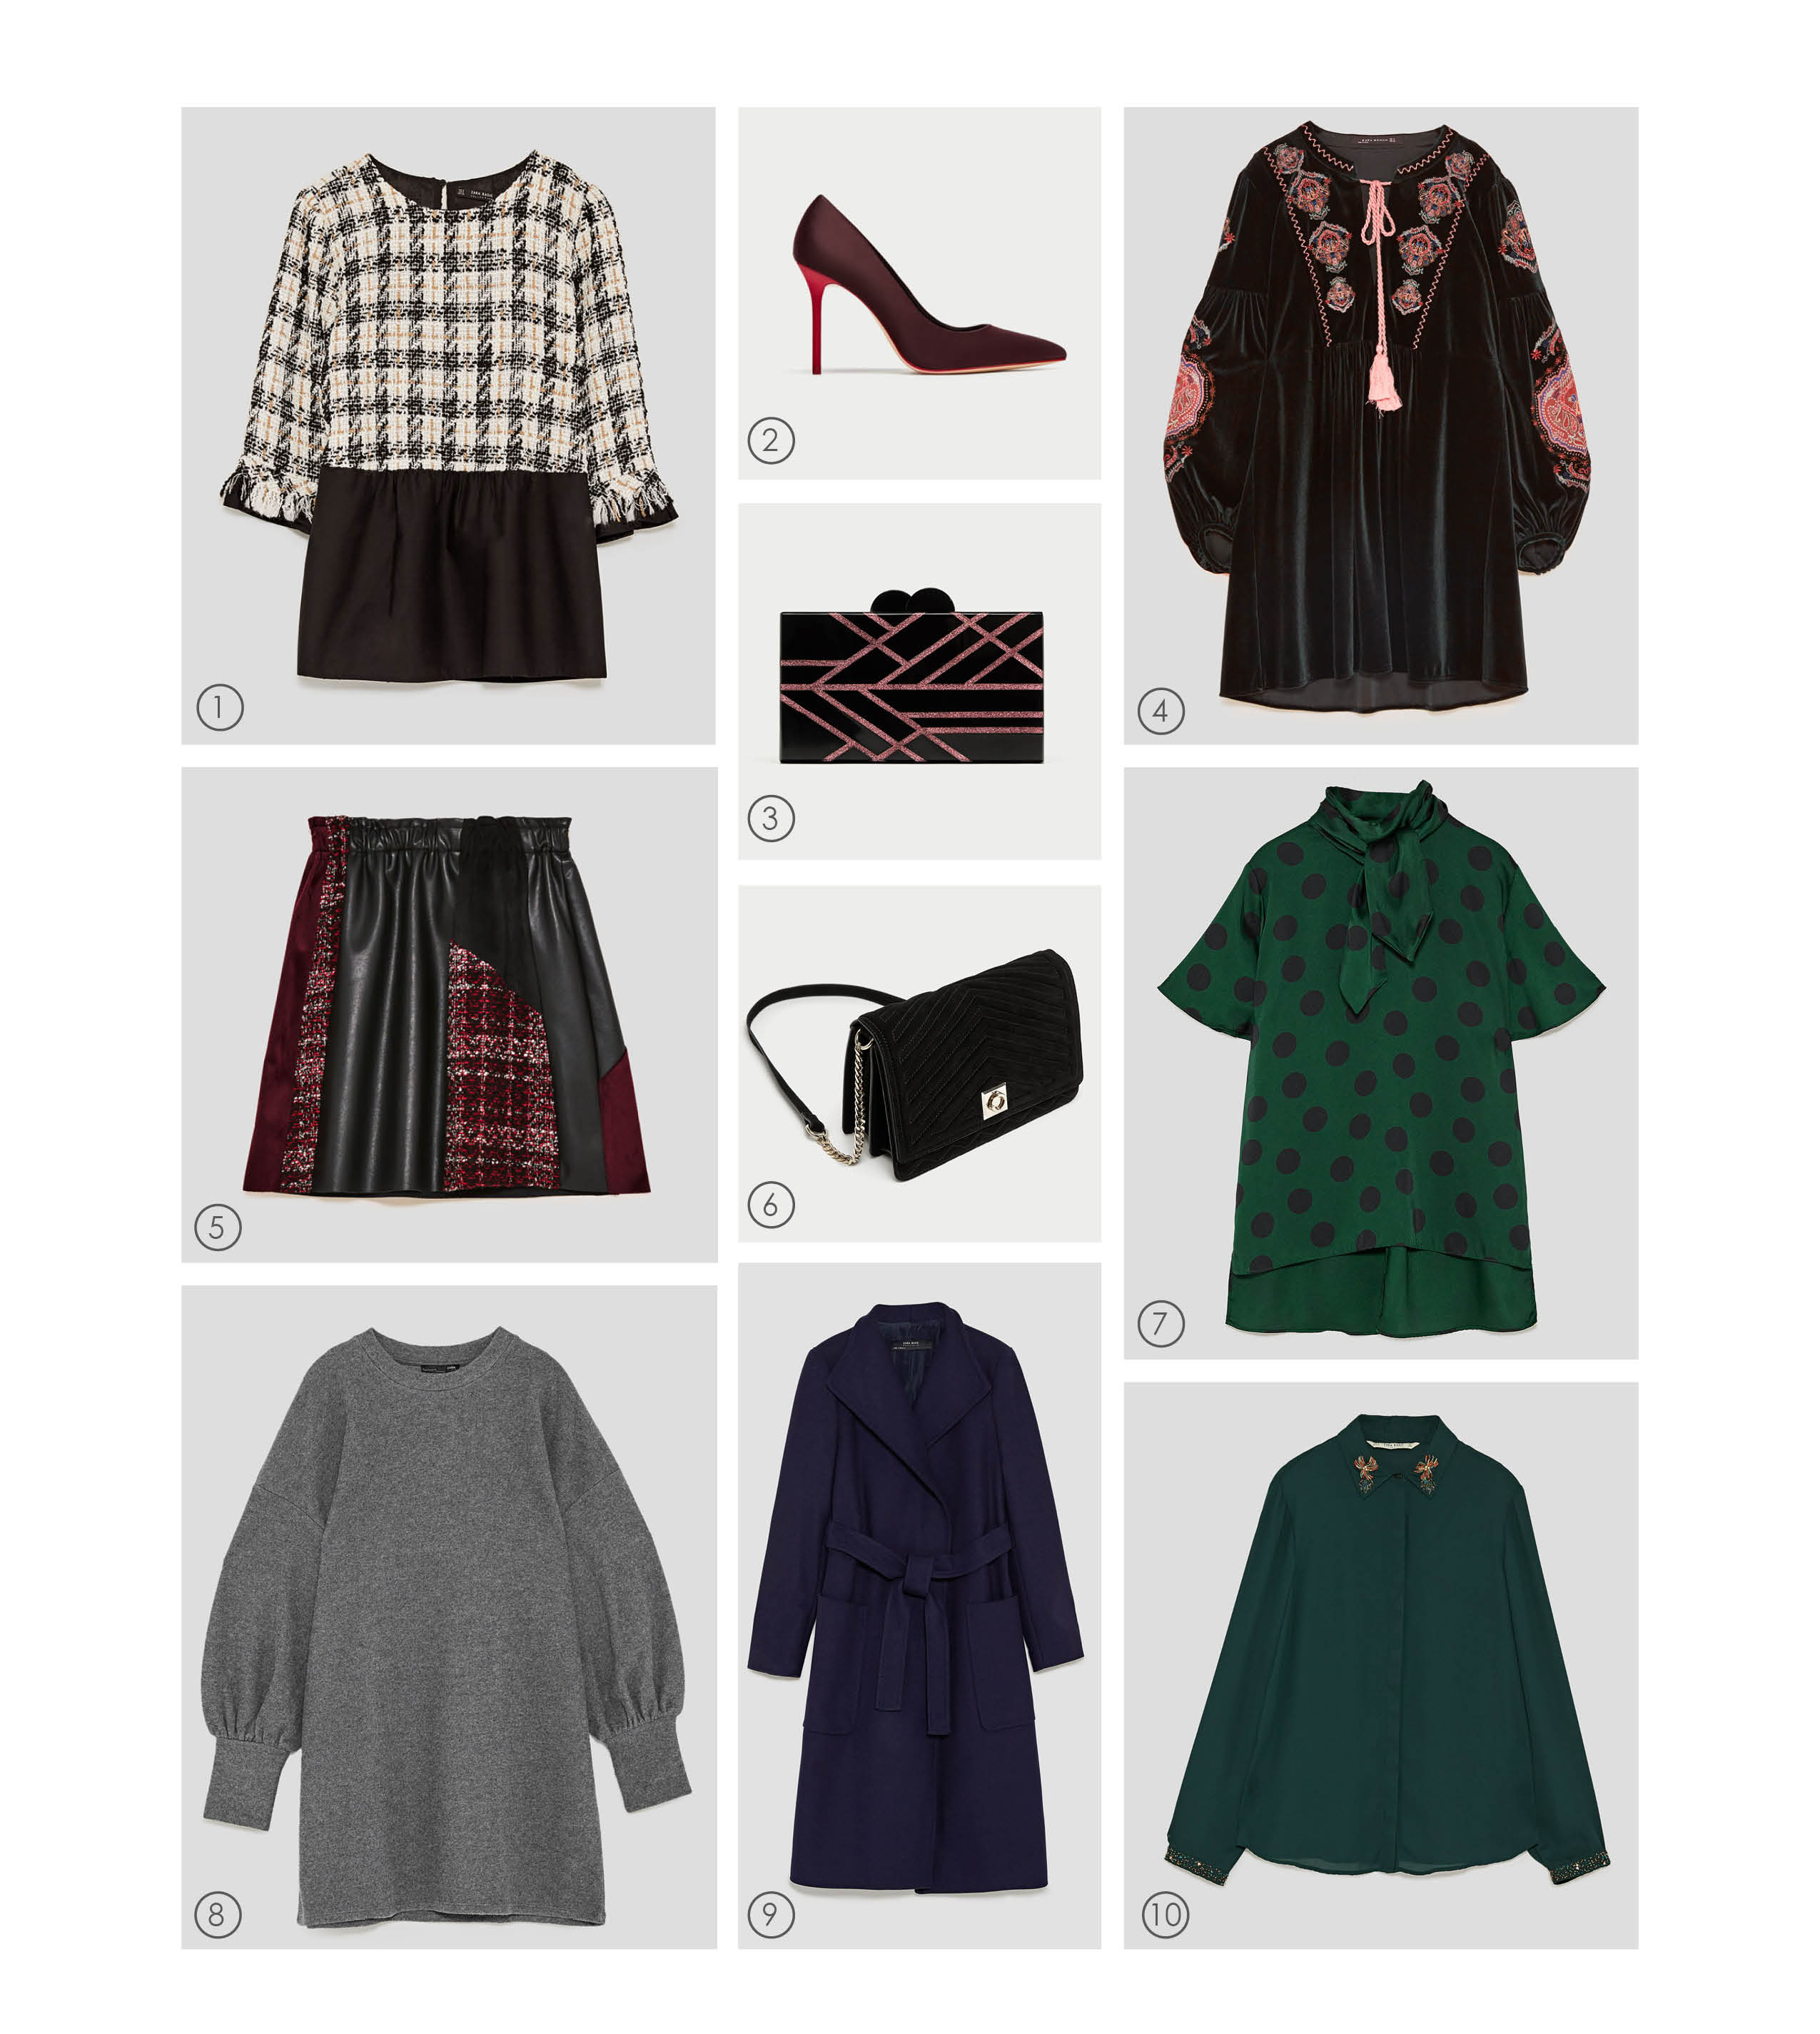 Zara New Arrivals - Top Picks